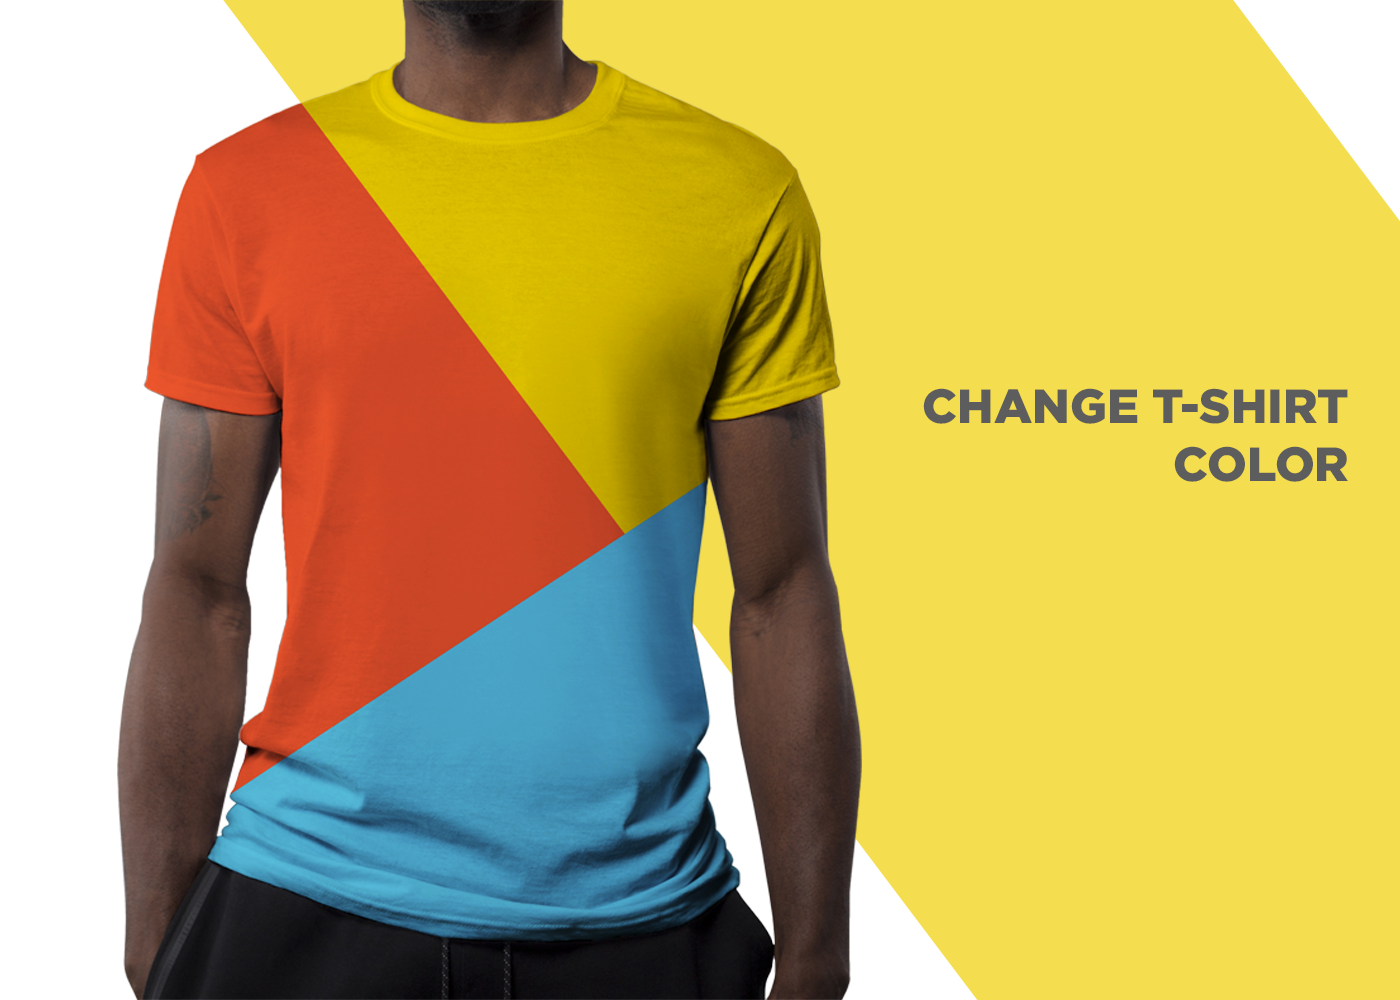 t-shirt Mockup free Tee-shirt T-Shirt Design graphic design  model free mockup  t-shirt mockup tee-shirt mockup